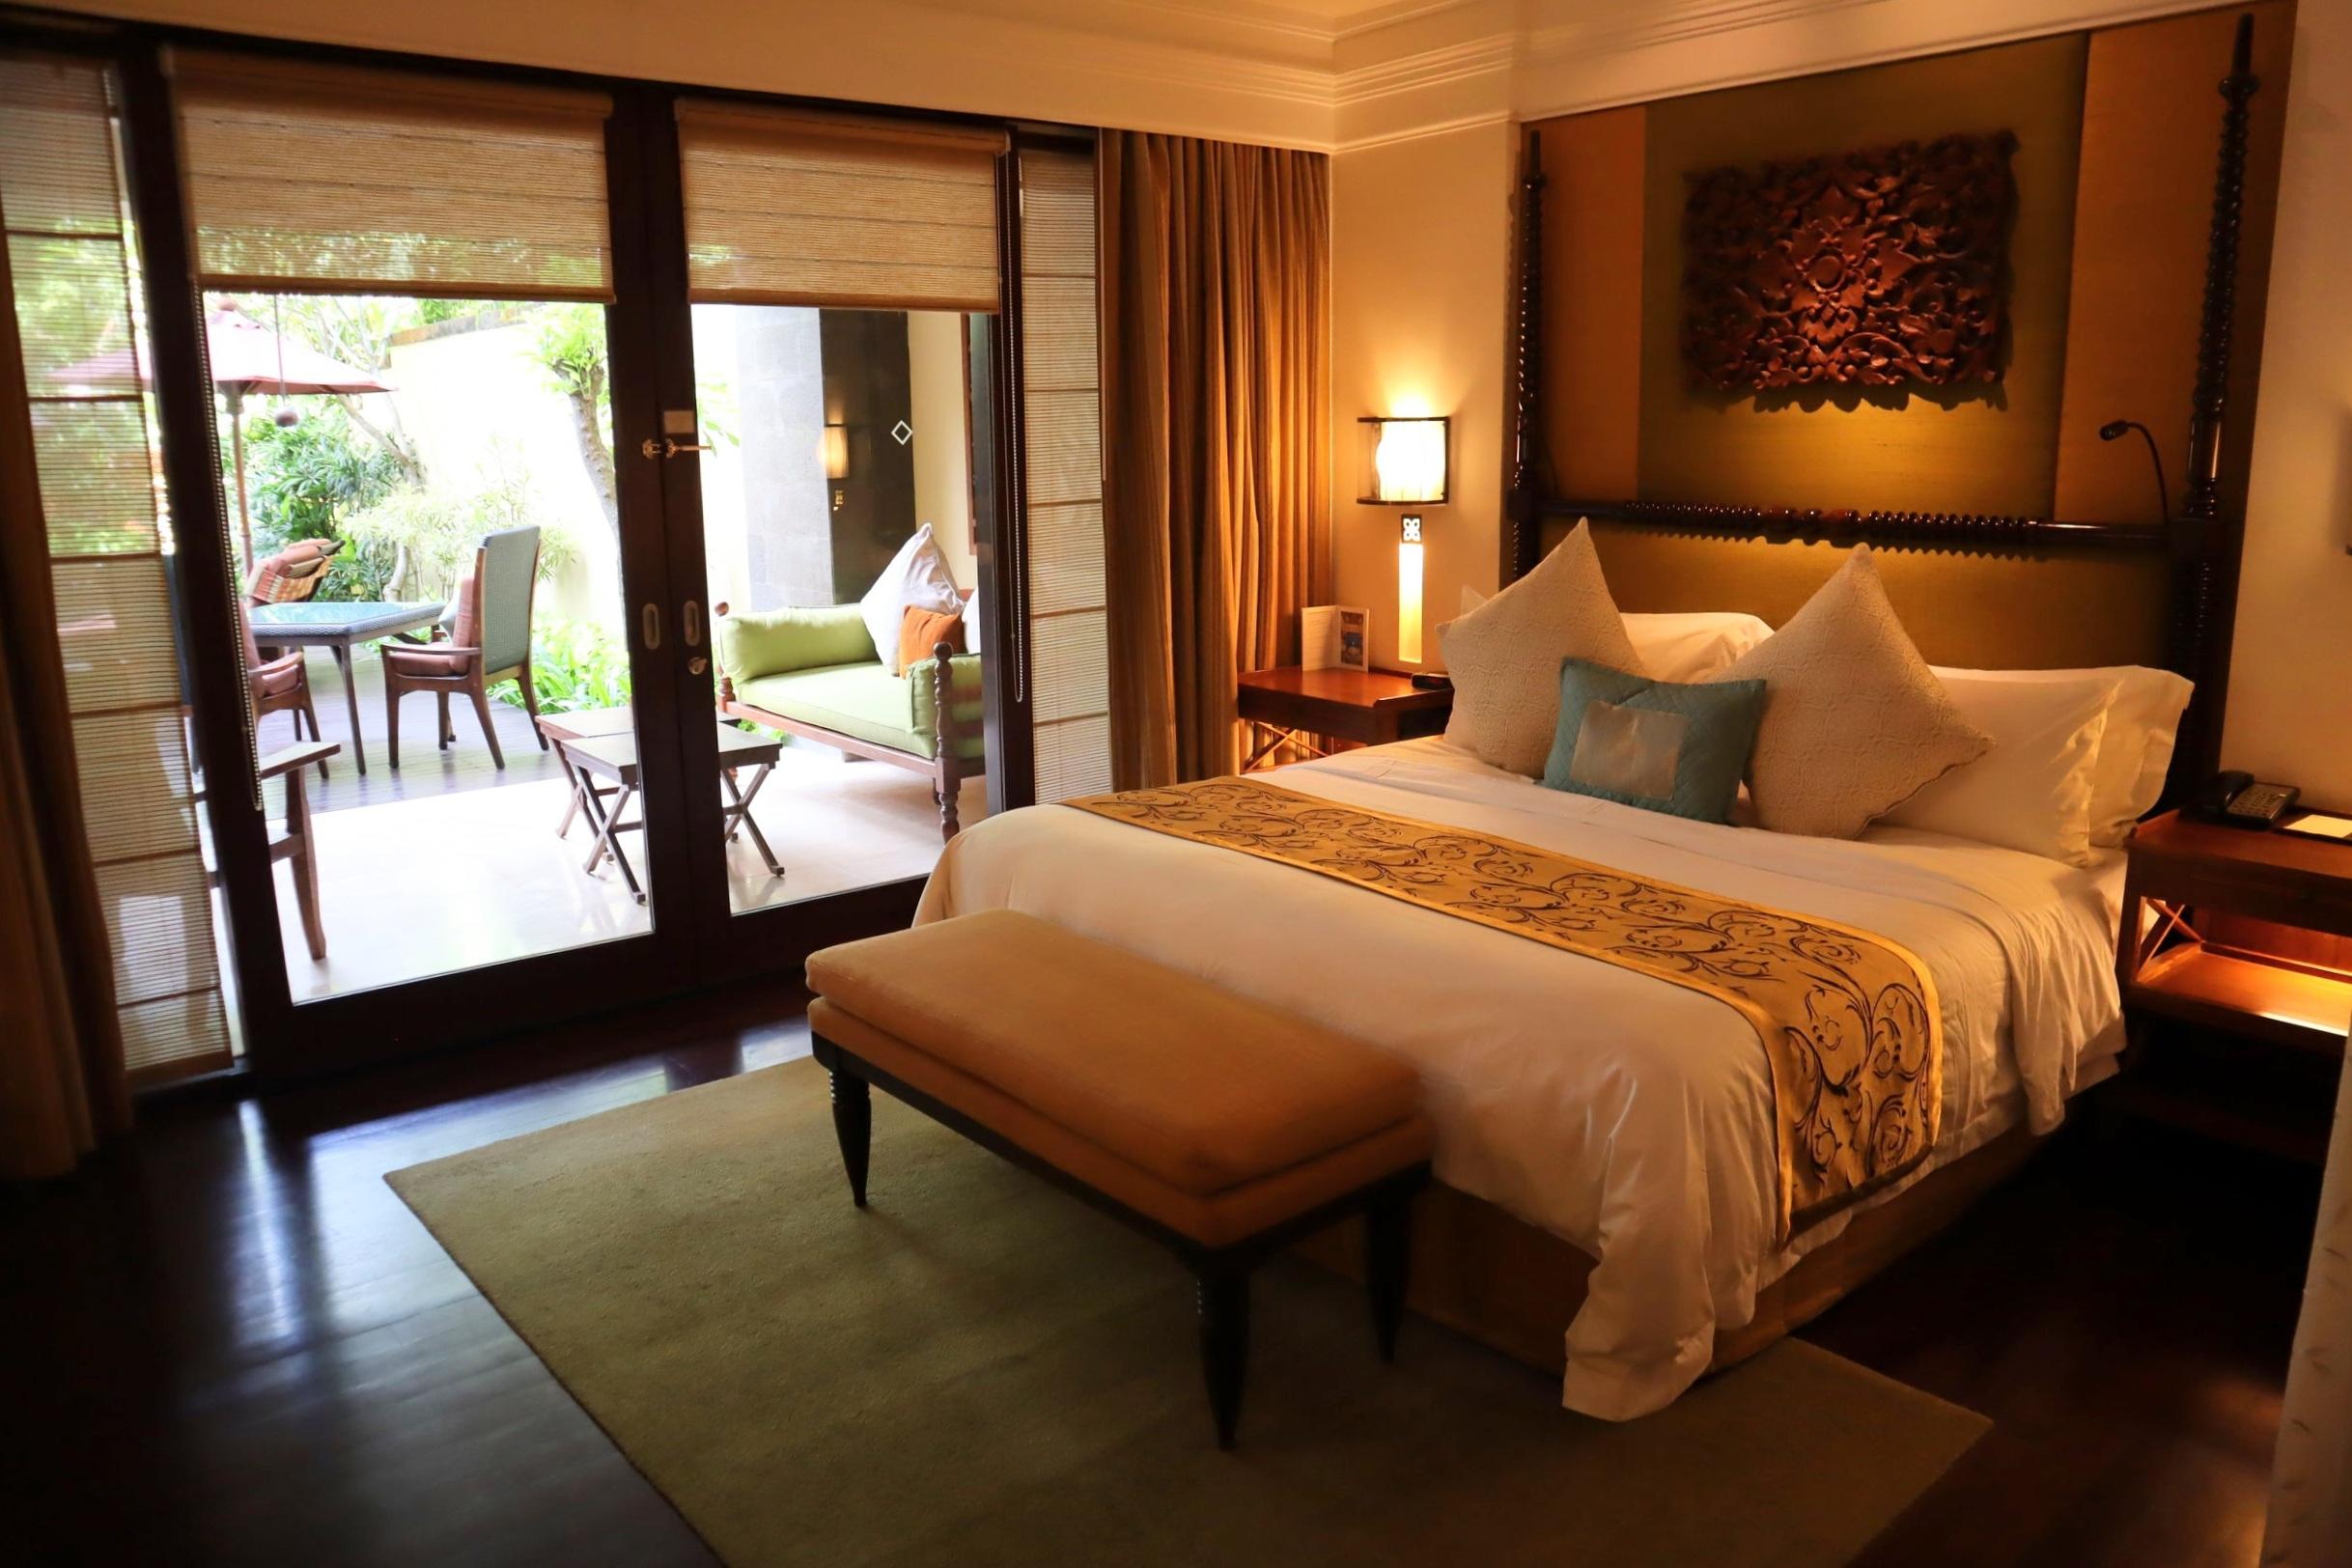 Review 85,000 Marriott Bonvoy points per night at the  St. Regis Bali